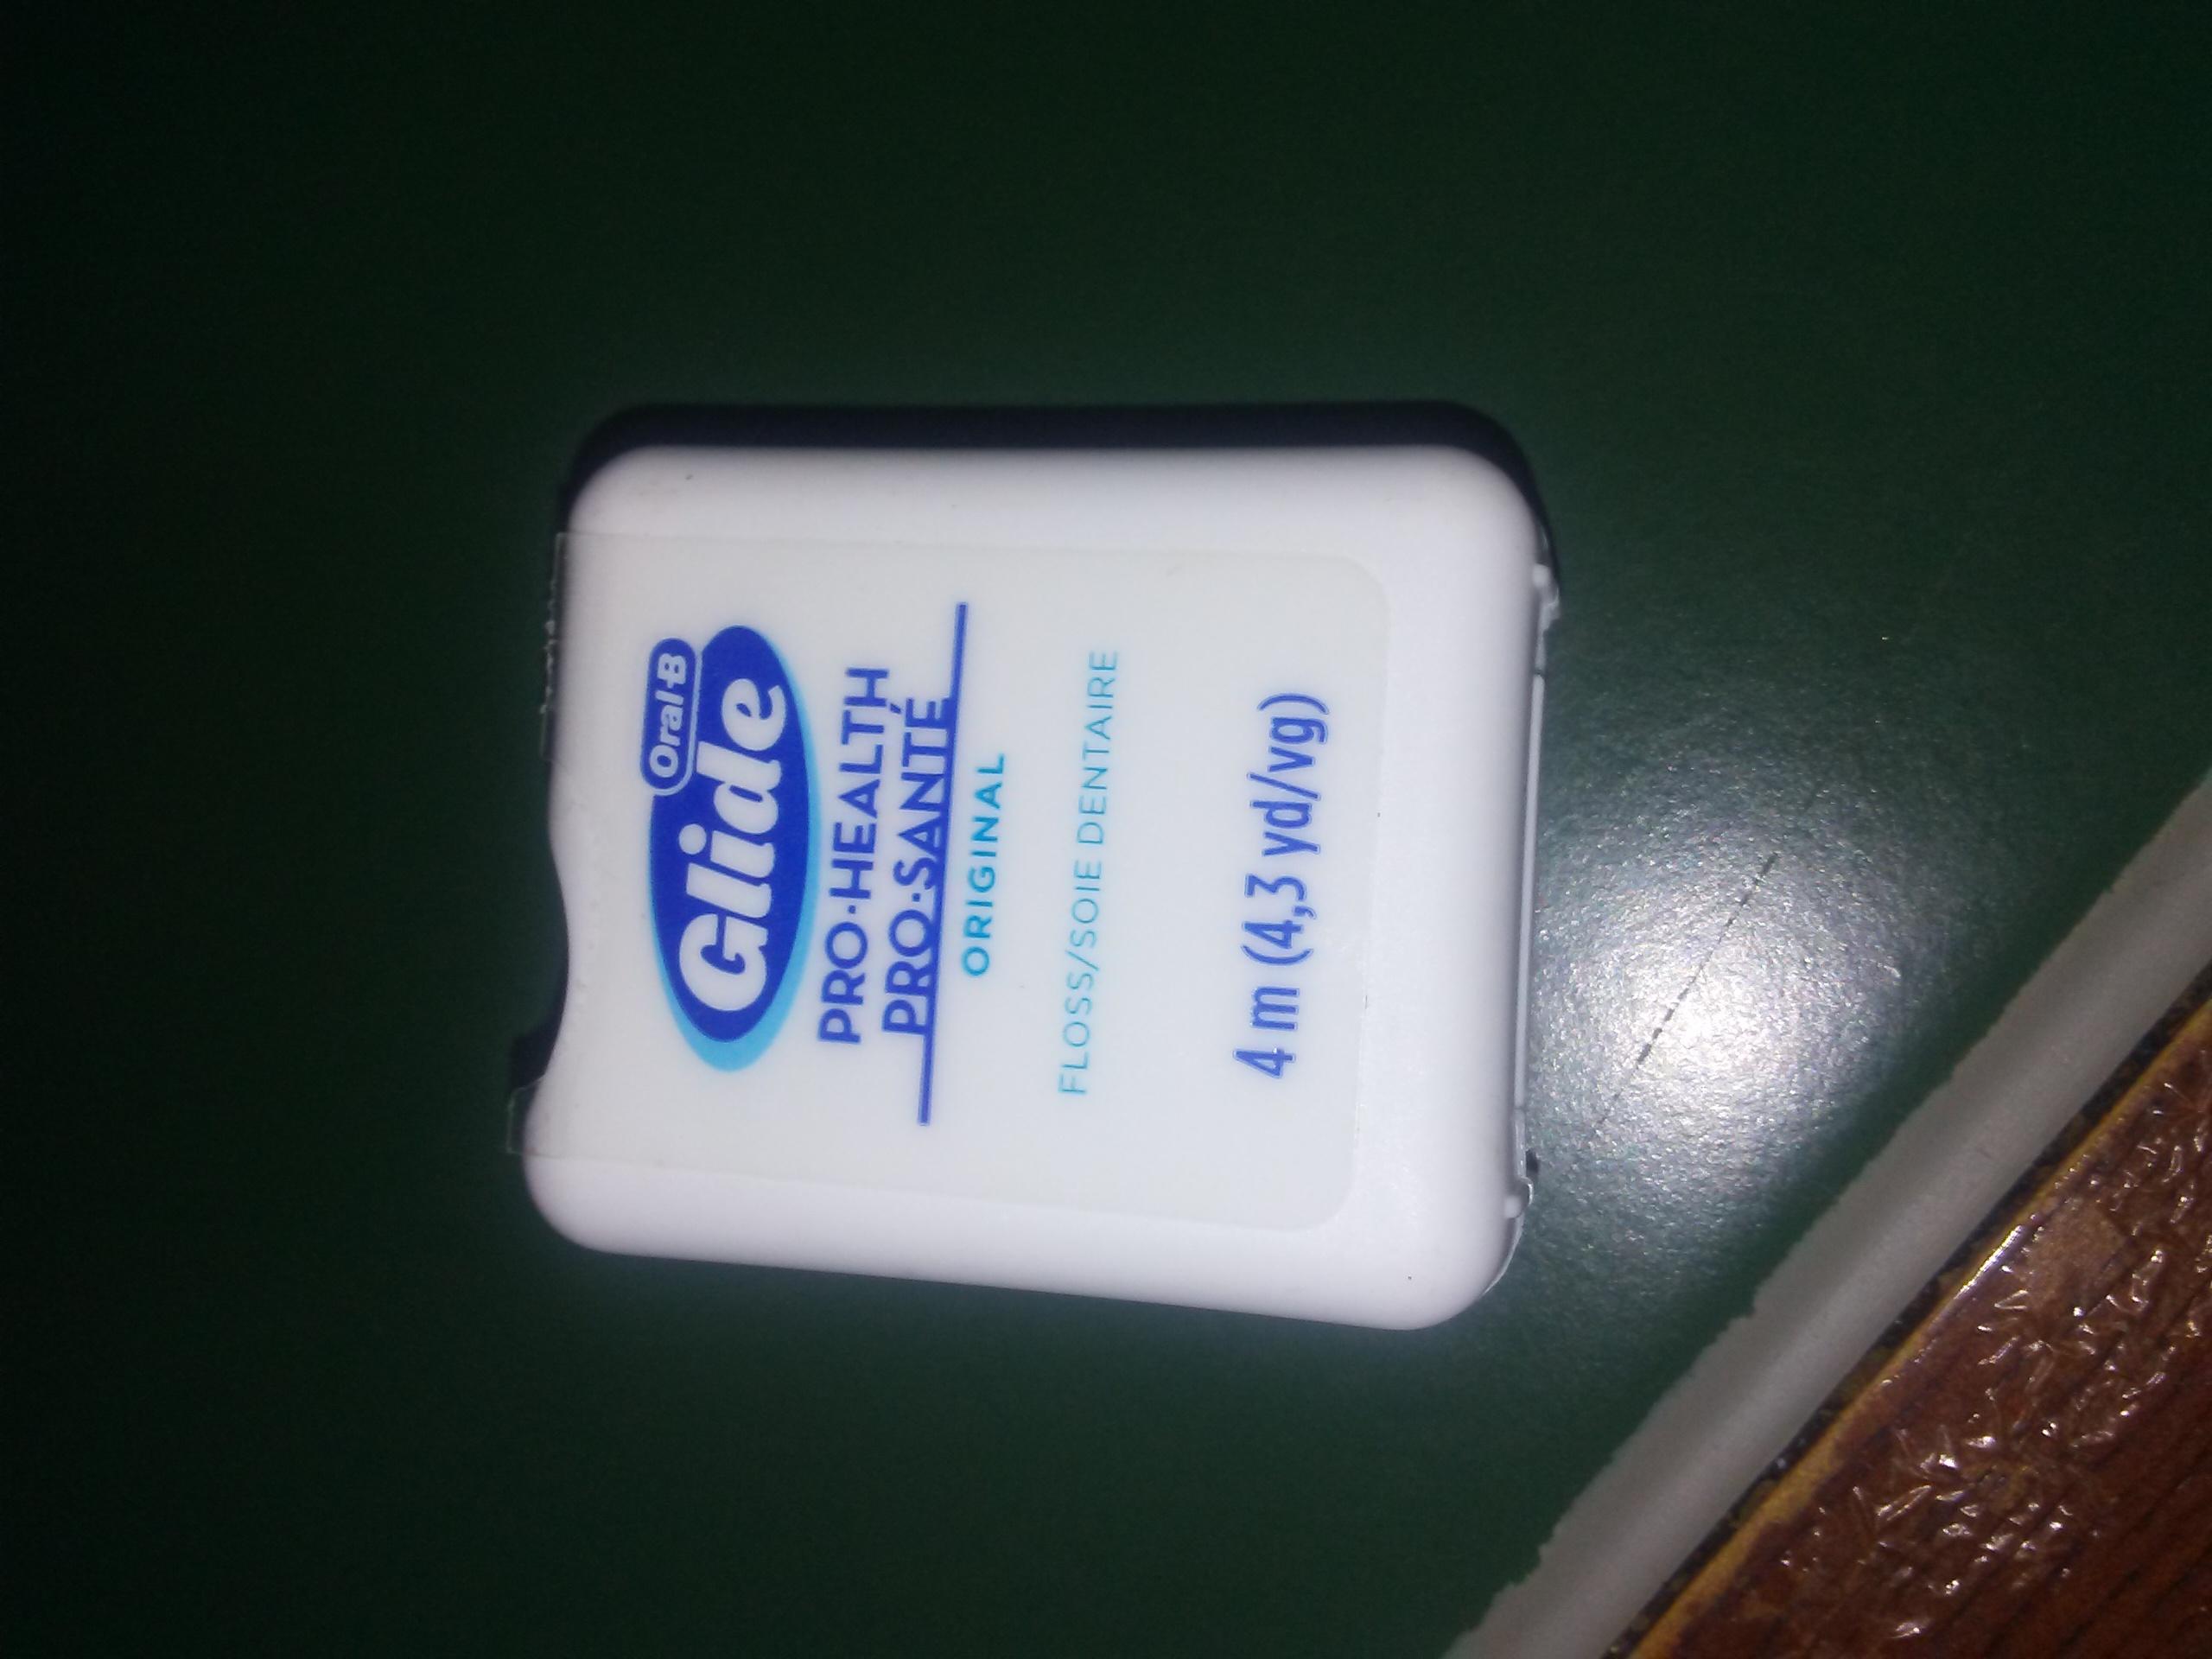 Oral-B Glide Floss Whitening + Scope uploaded by stephanie w.